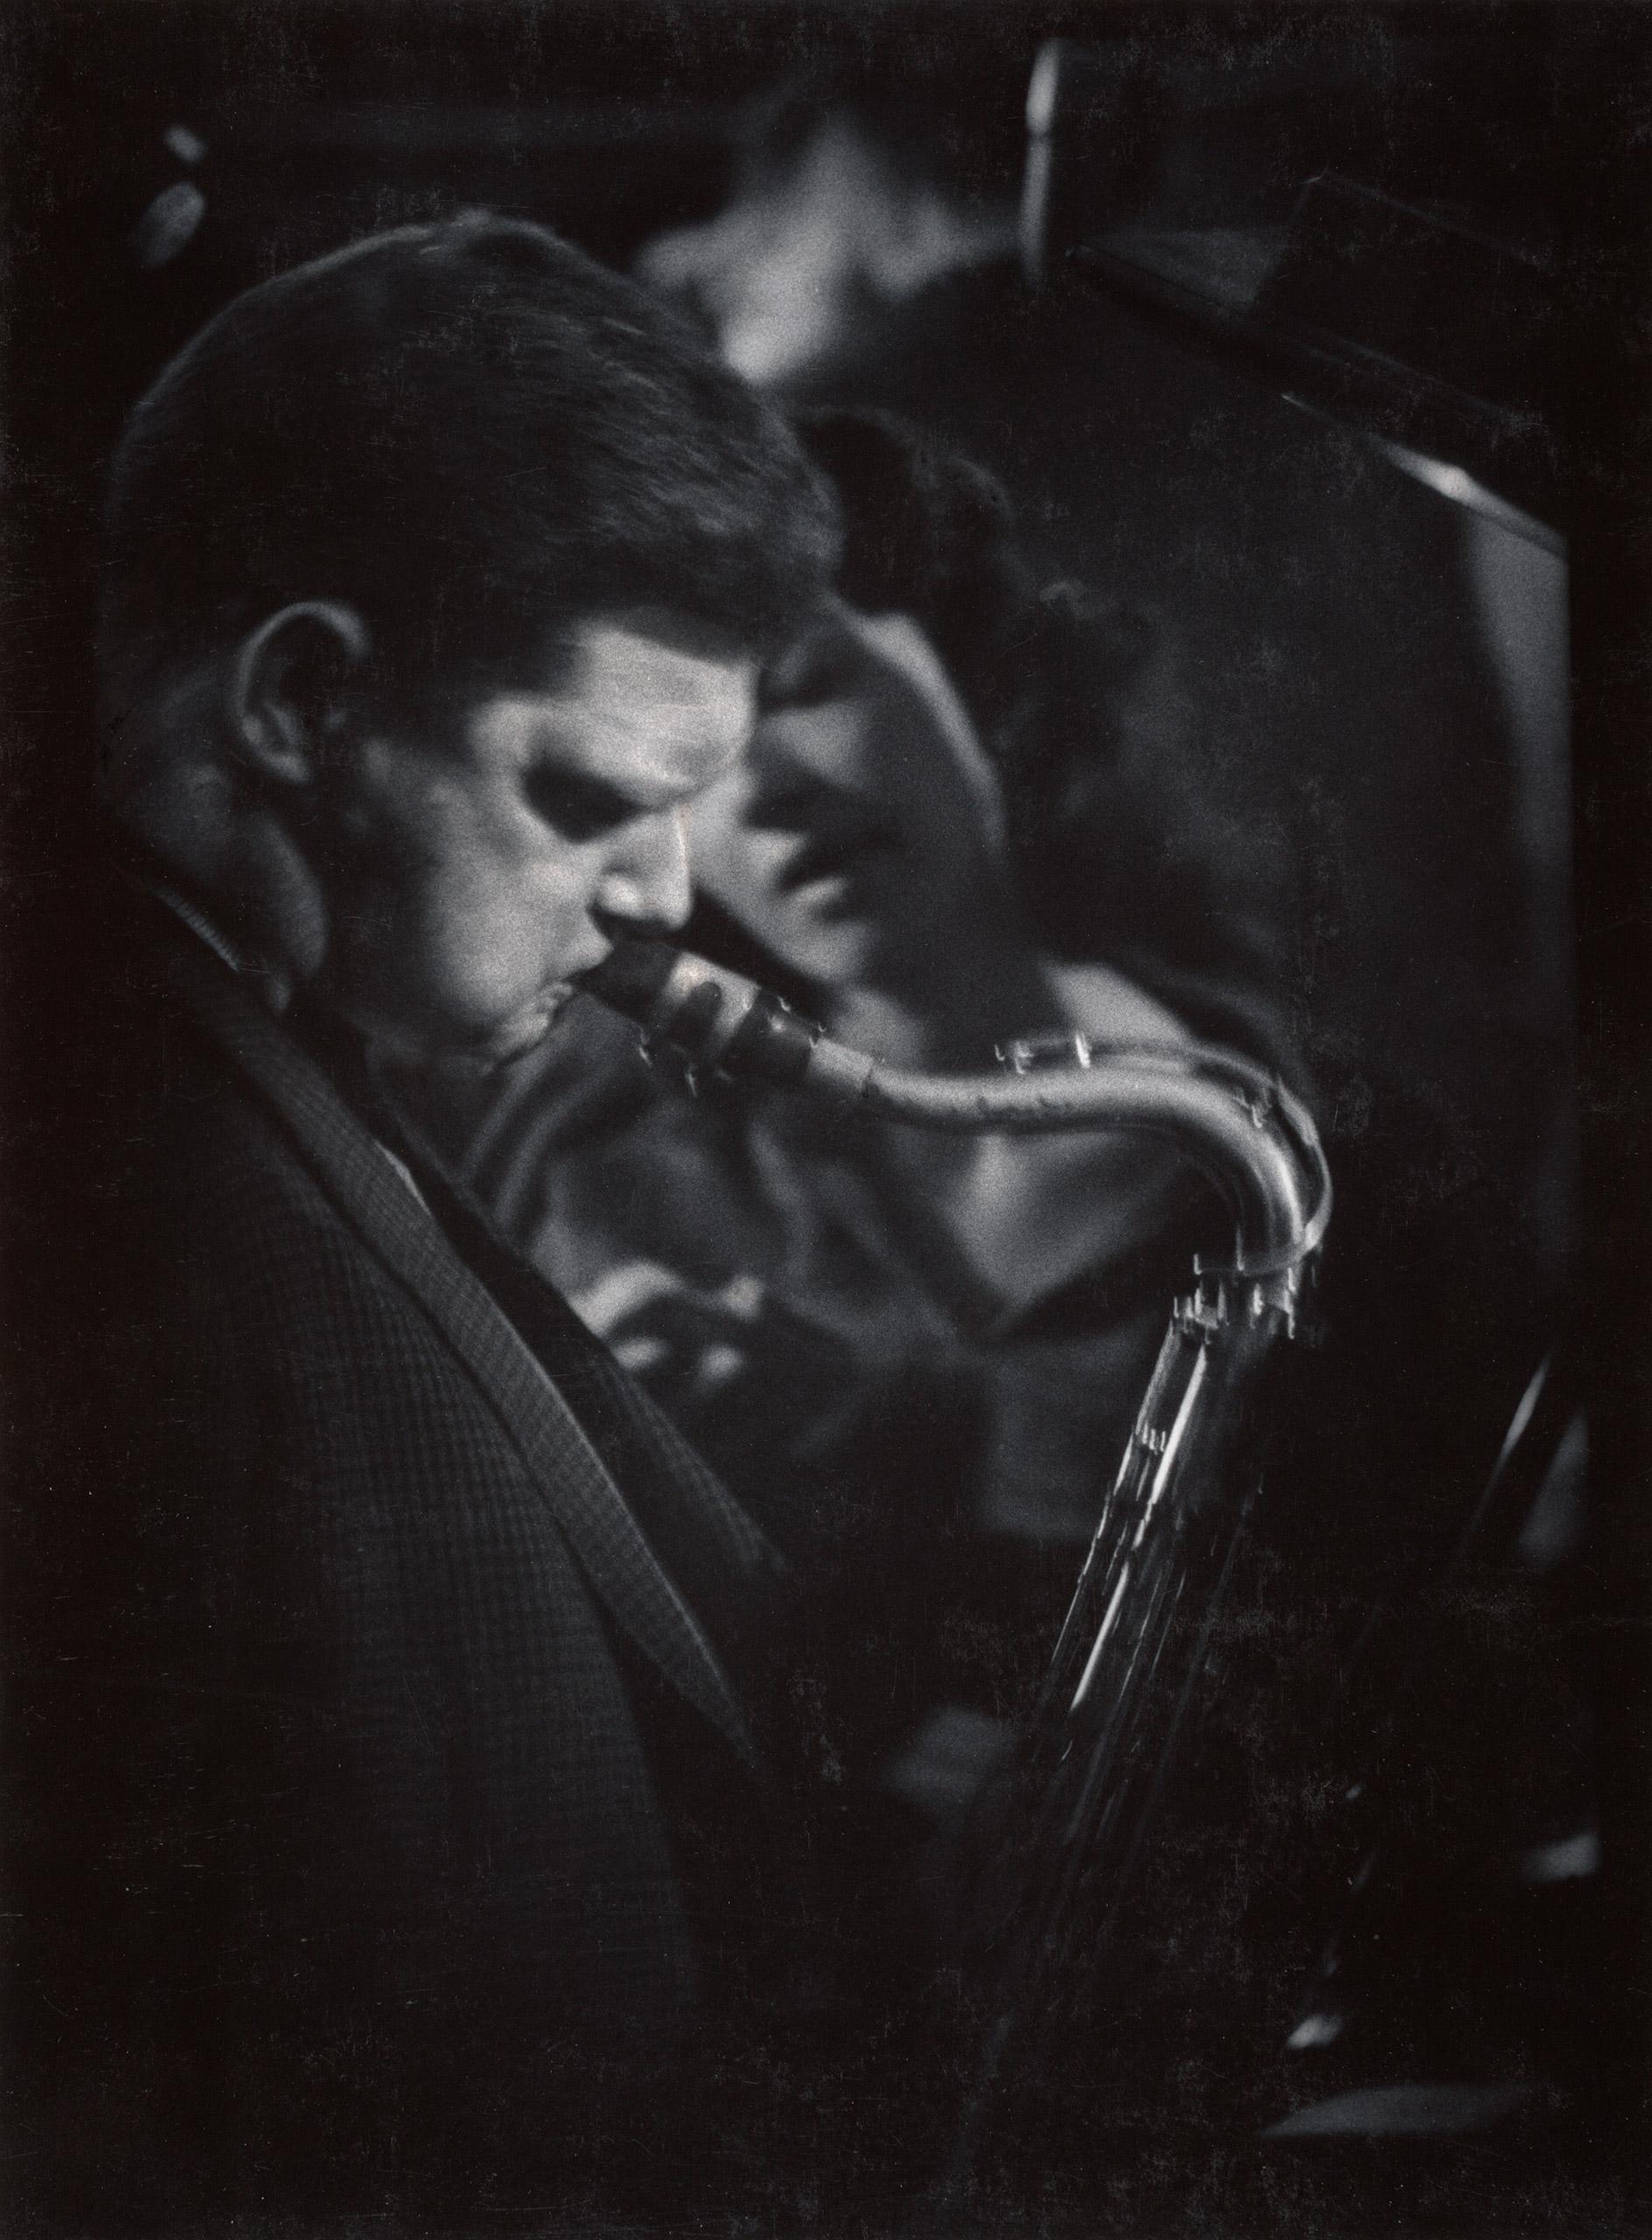 Portrait of musician Zoot Sims.